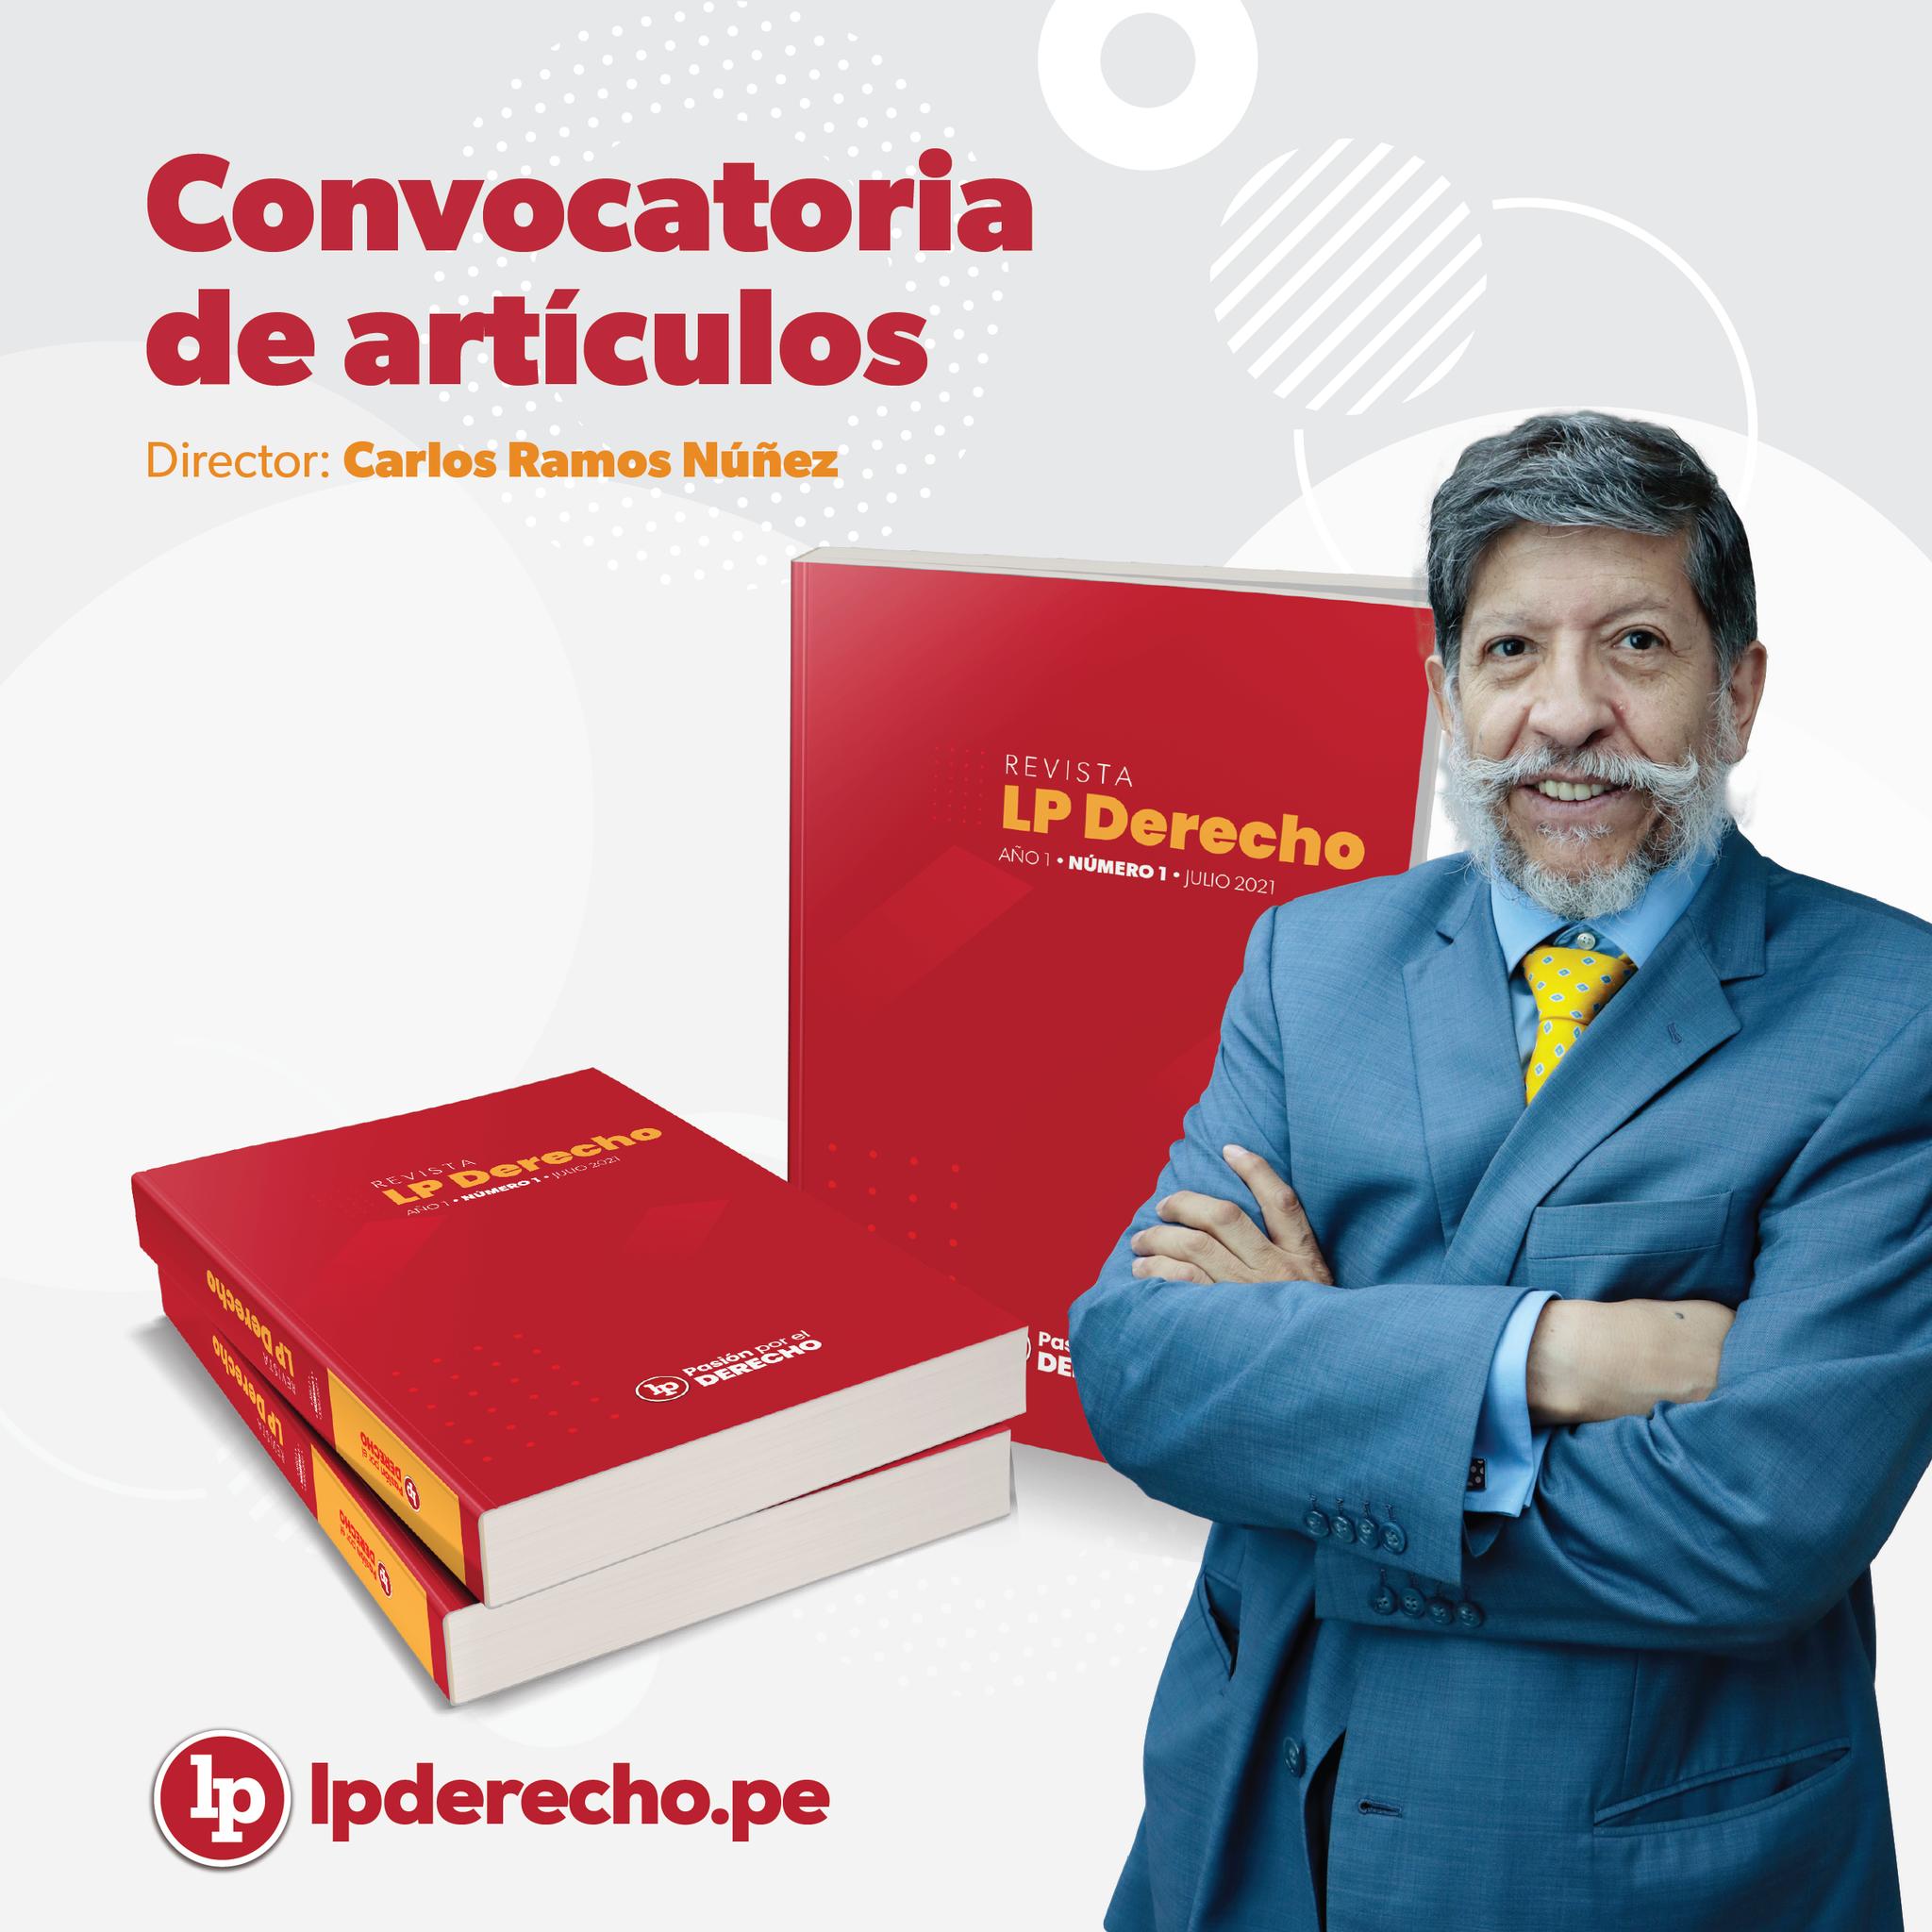 Carlos Ramos Núñez revista LP con logo de LP